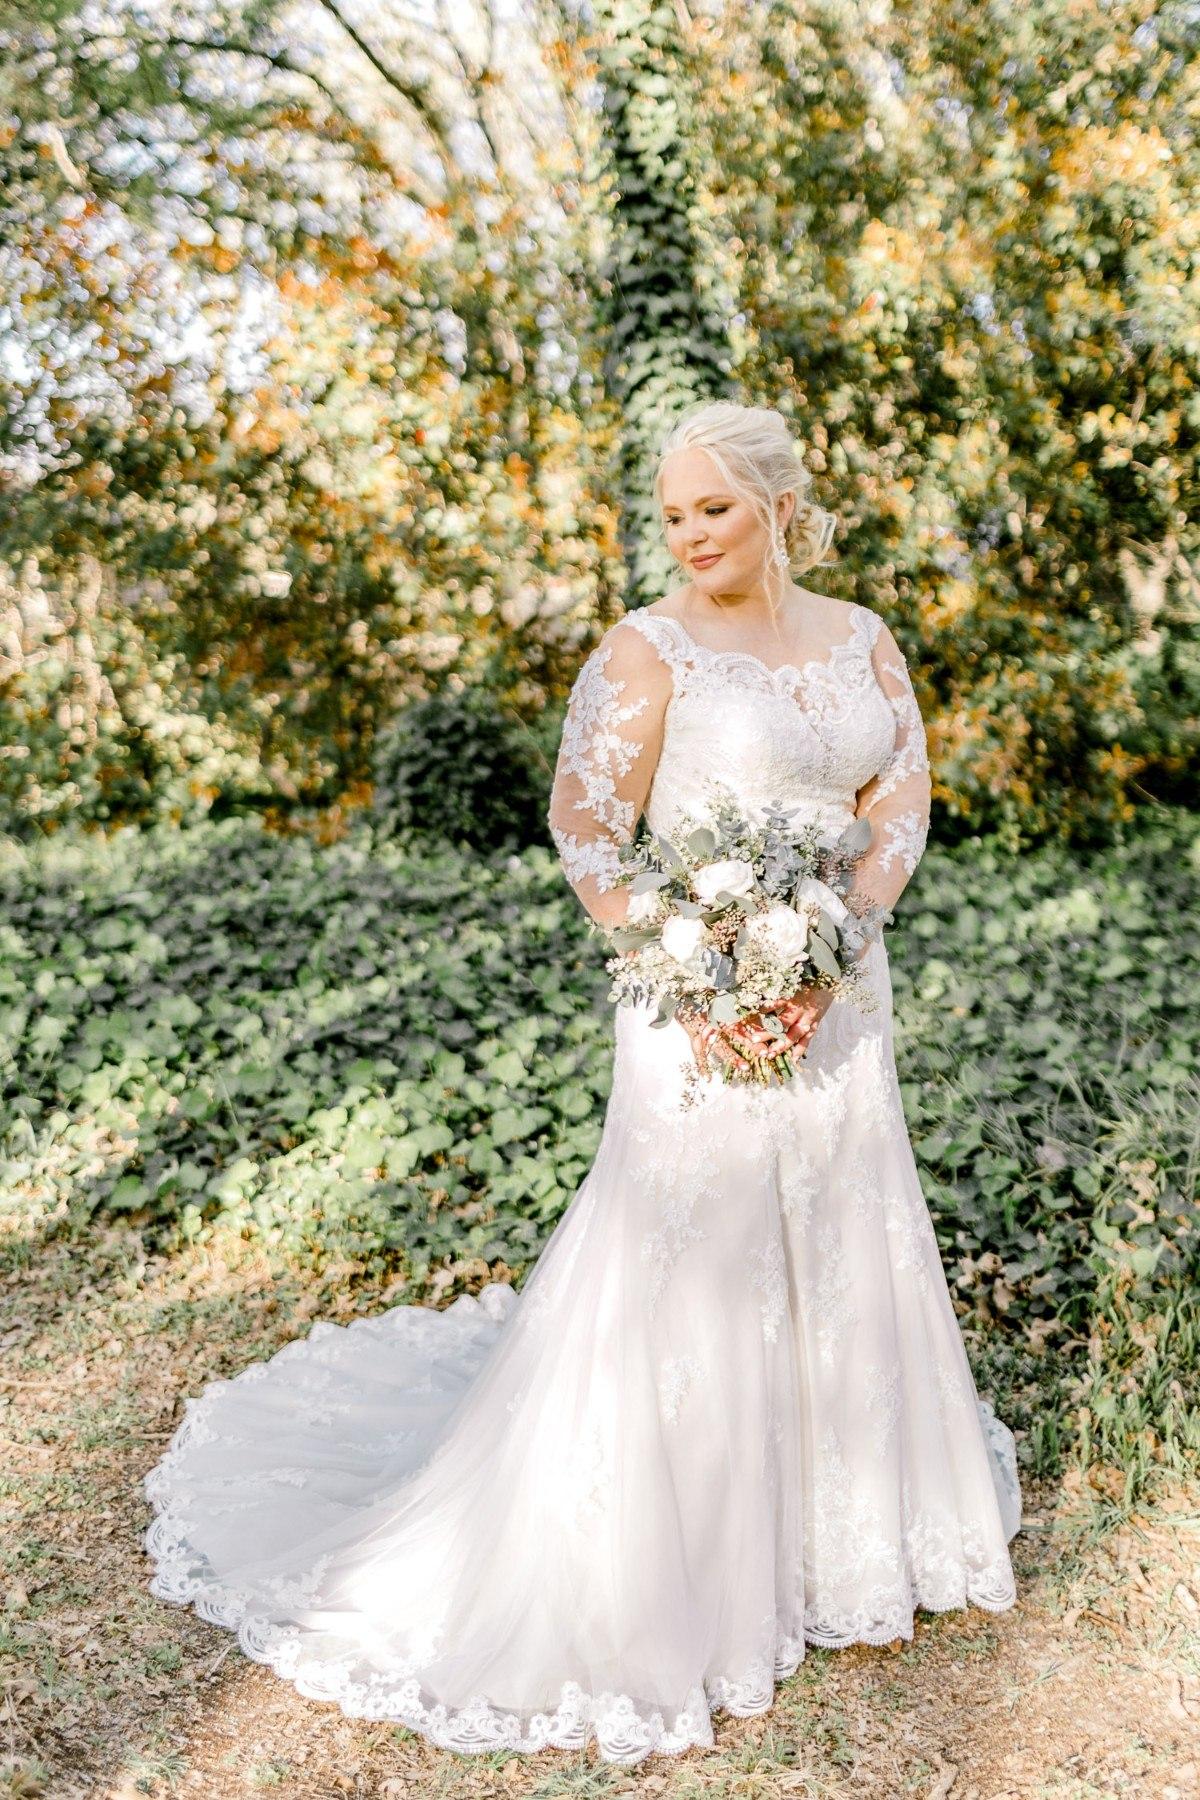 casidy-bridals-tradinghouse-lake-waco-wedding-photographer-kaitlyn-bullard-02.jpg